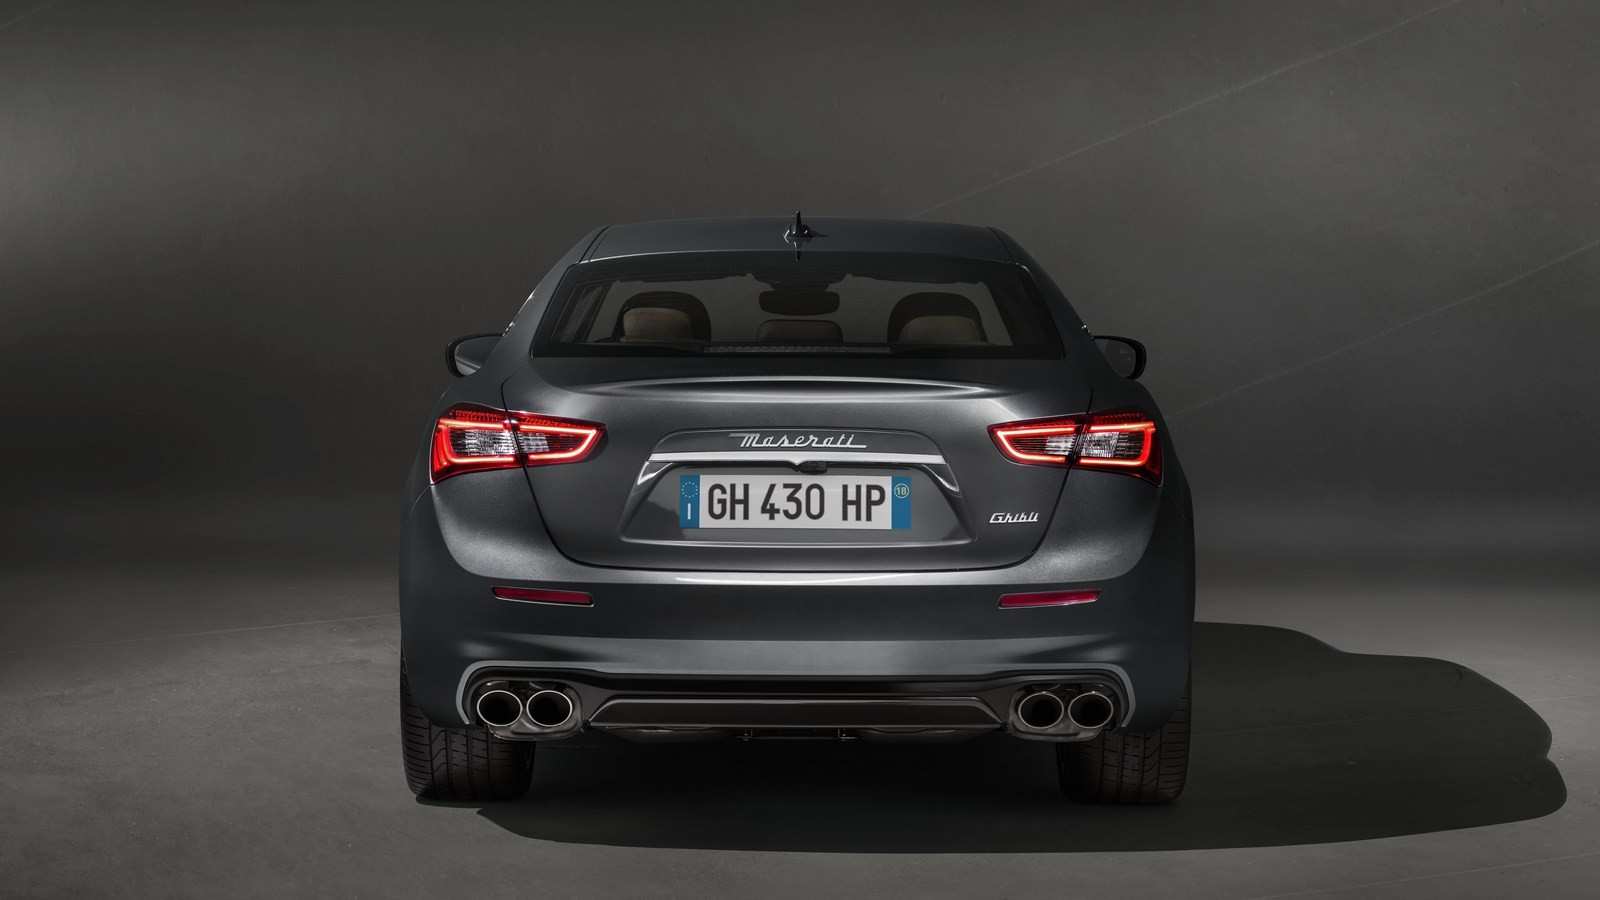 13242-MaseratisvelaleprimeimmaginidellanuovaGhibliGranLusso